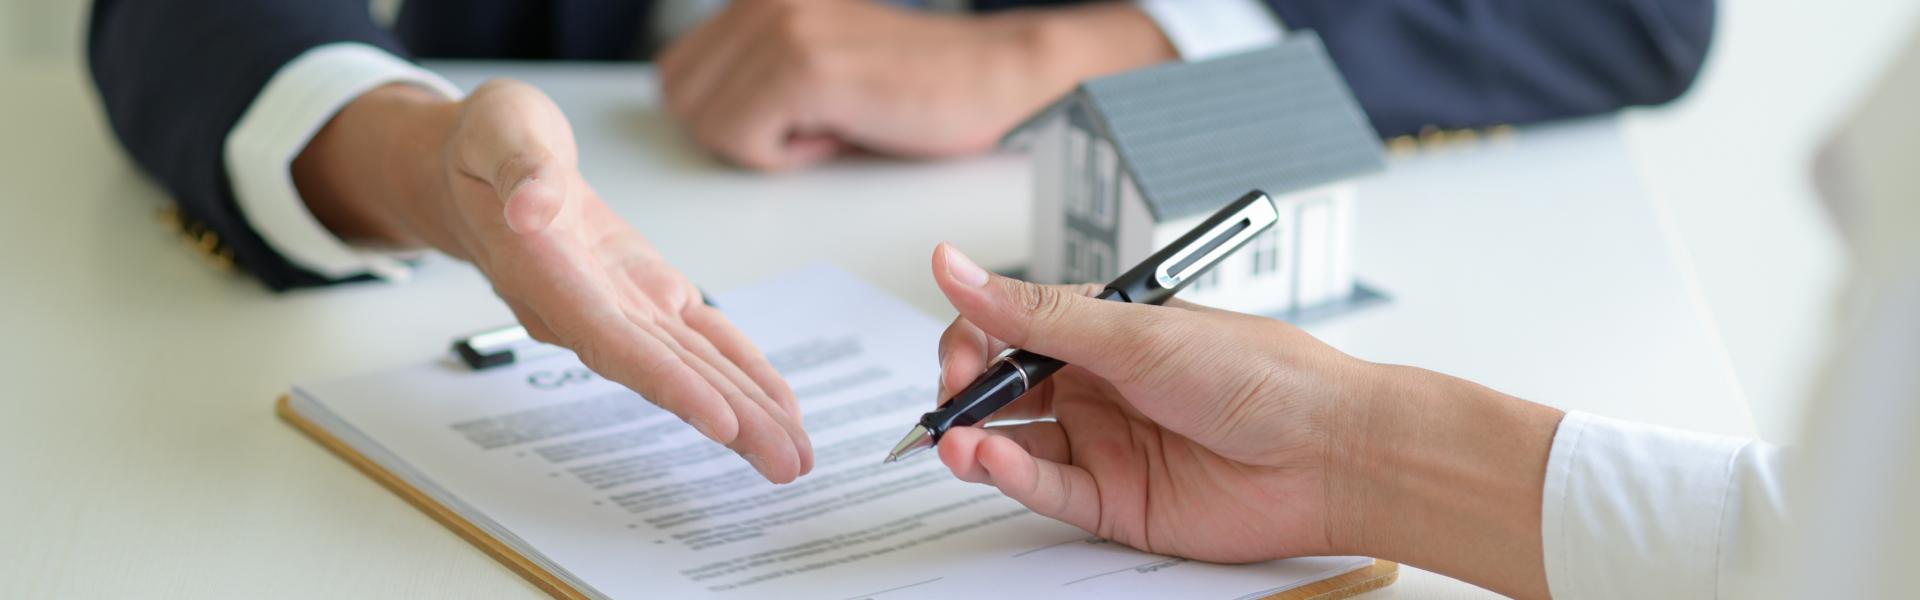 10 Tip Networking Like a Boss - AmCap Home Loans